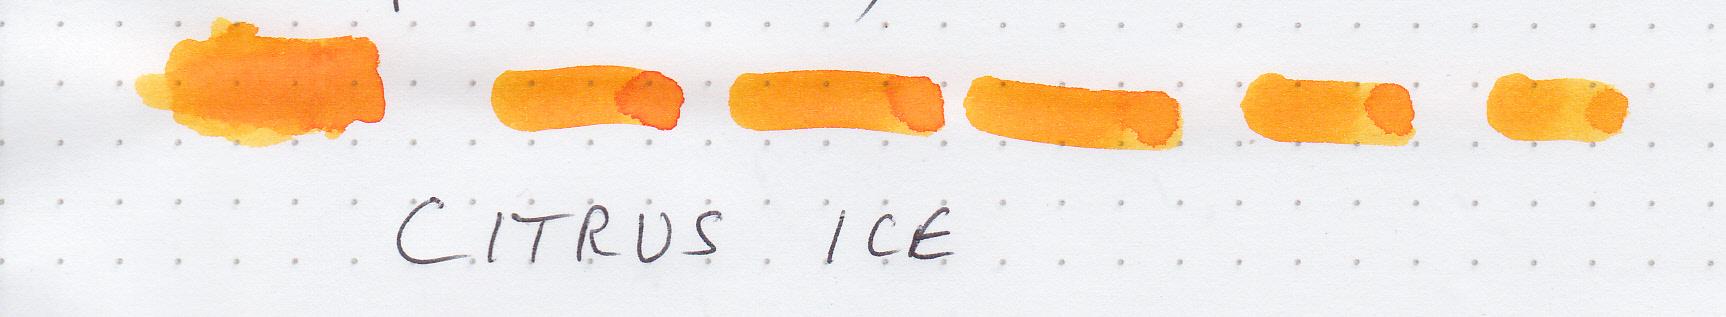 fpn_1507481645__diamine_shimmering_citru